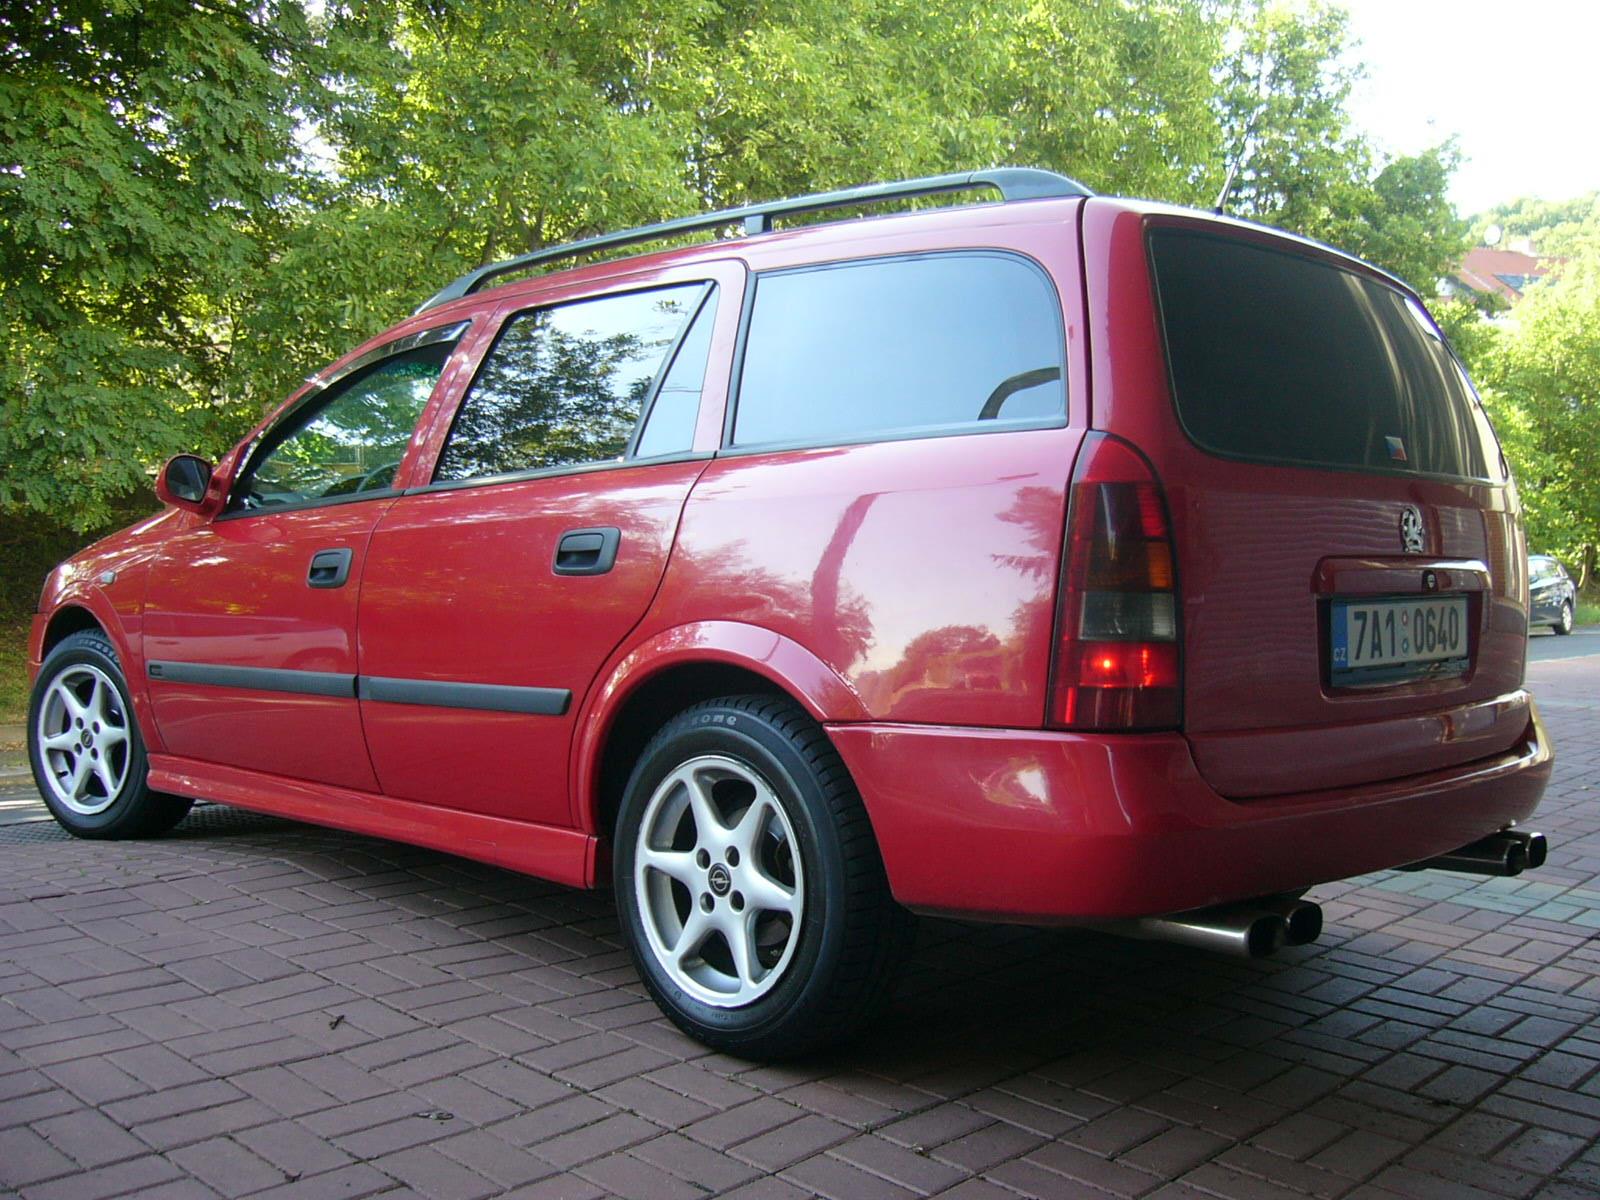 Duphyho Opel Astra G caravan